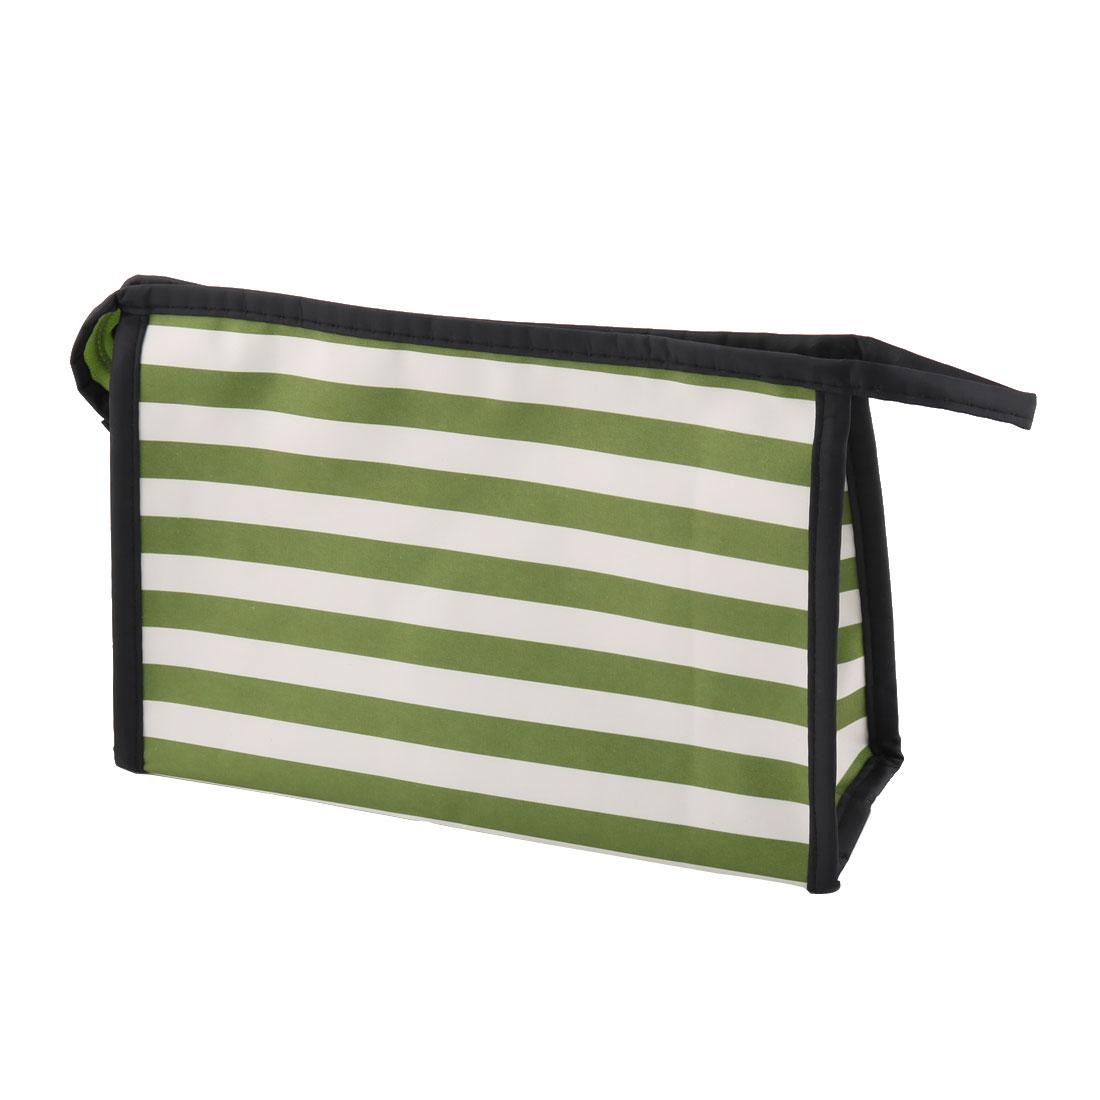 Lady Polyester Stripes Pattern Zipper Closure Cosmetic Makeup Organizer Bag Green